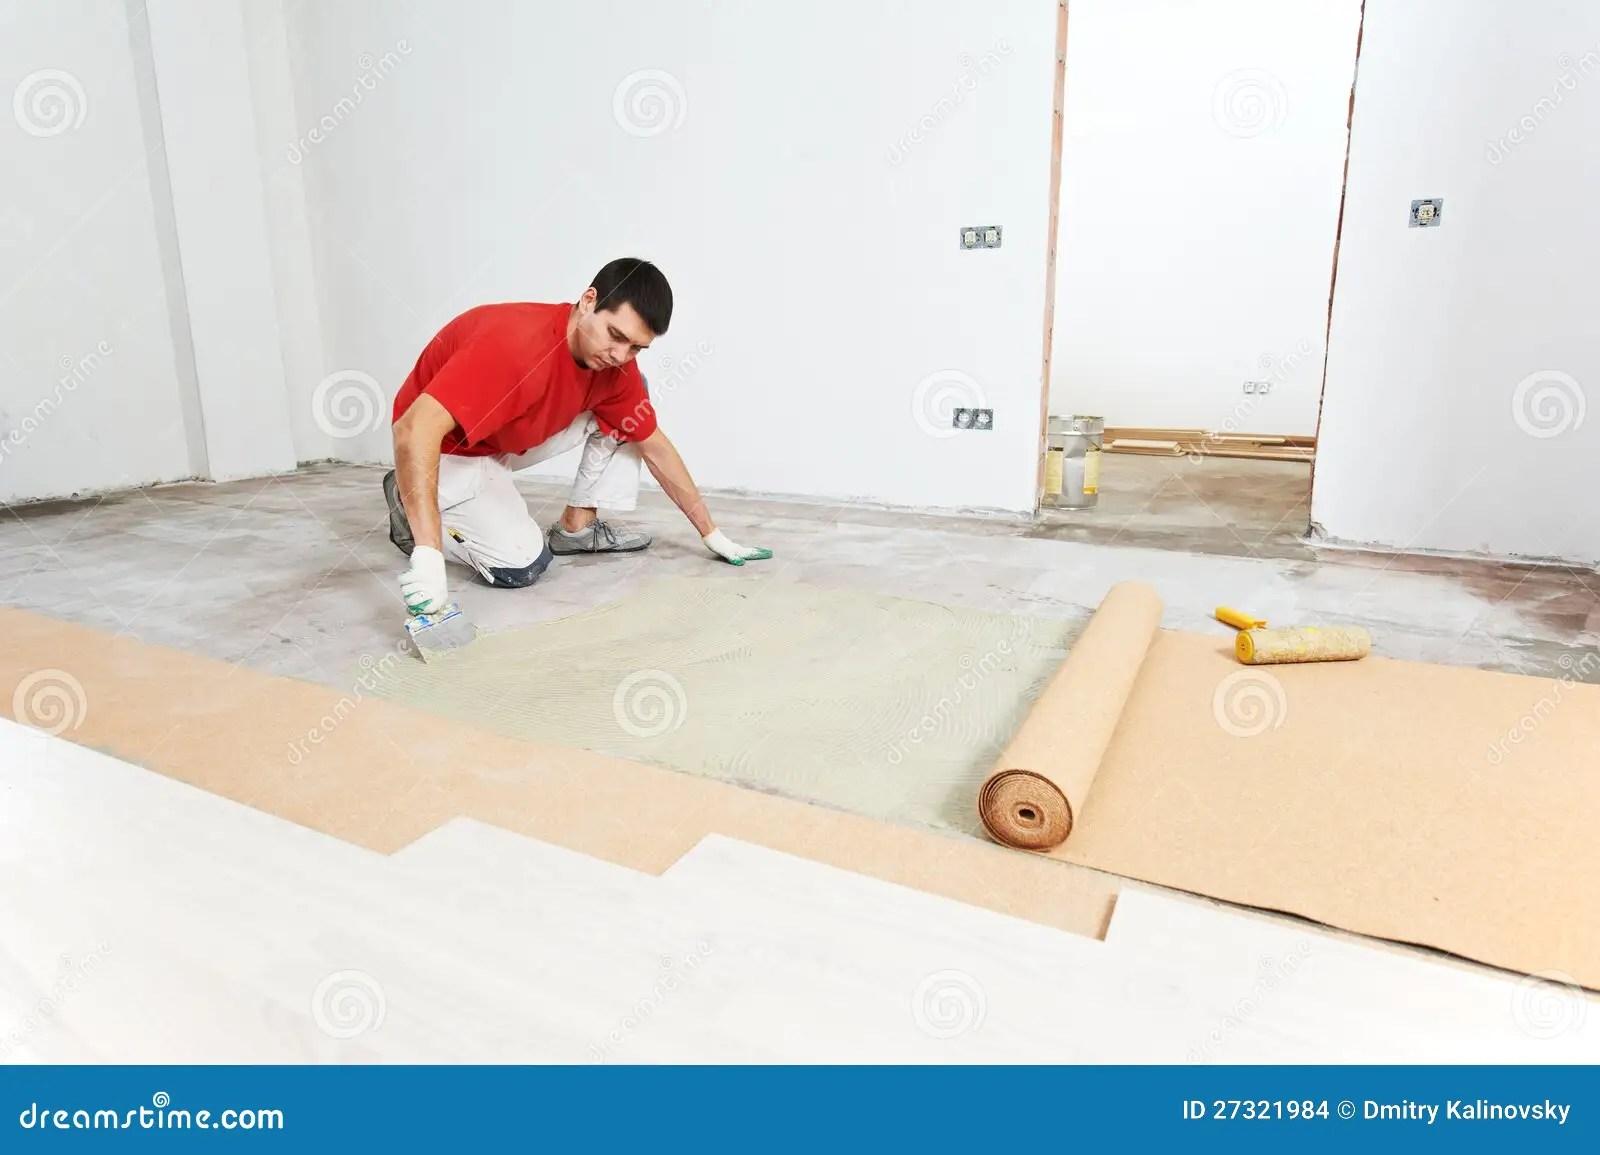 Parquet Floor Work With Cork Layer Stock Images  Image